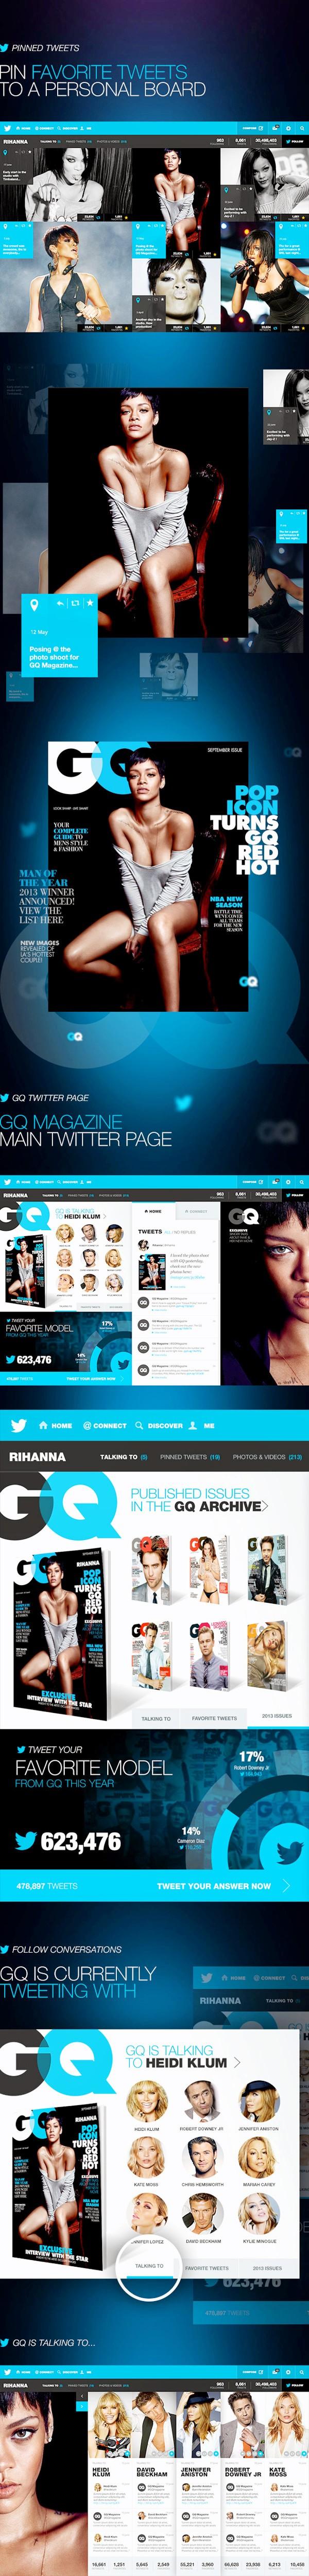 twitter-redesign-5